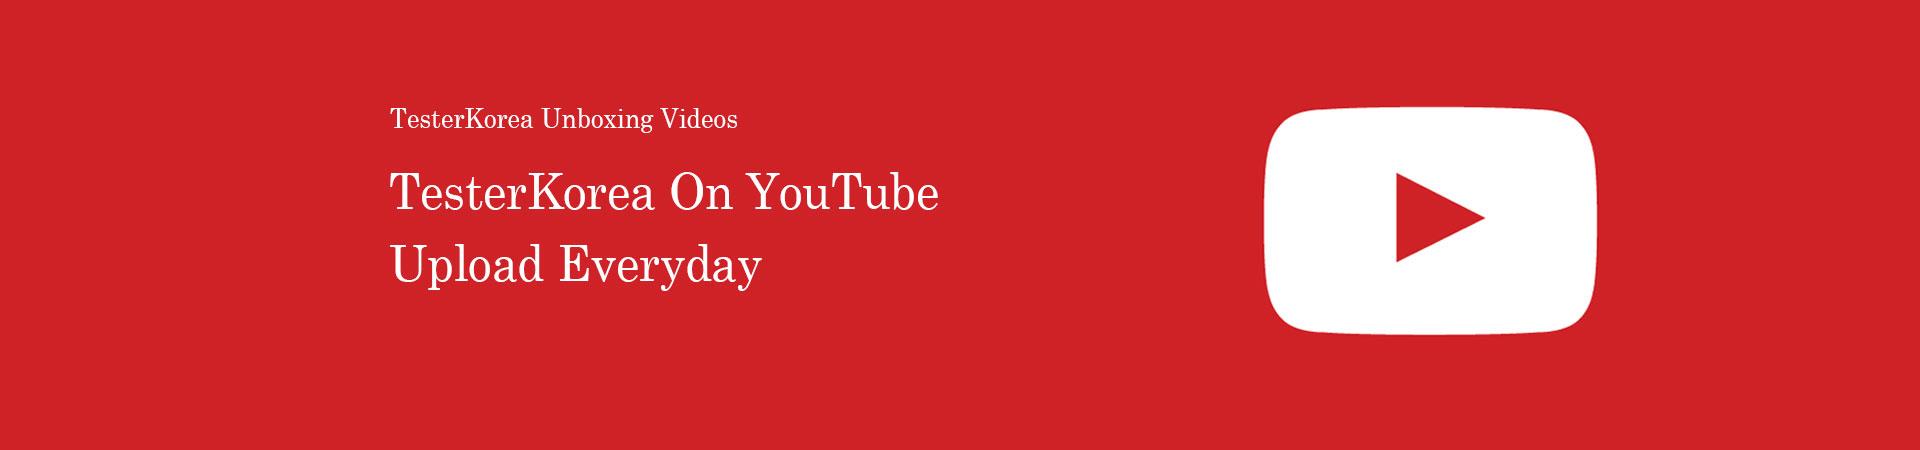 youtube Testerkorea 유튜브 테스터코리아